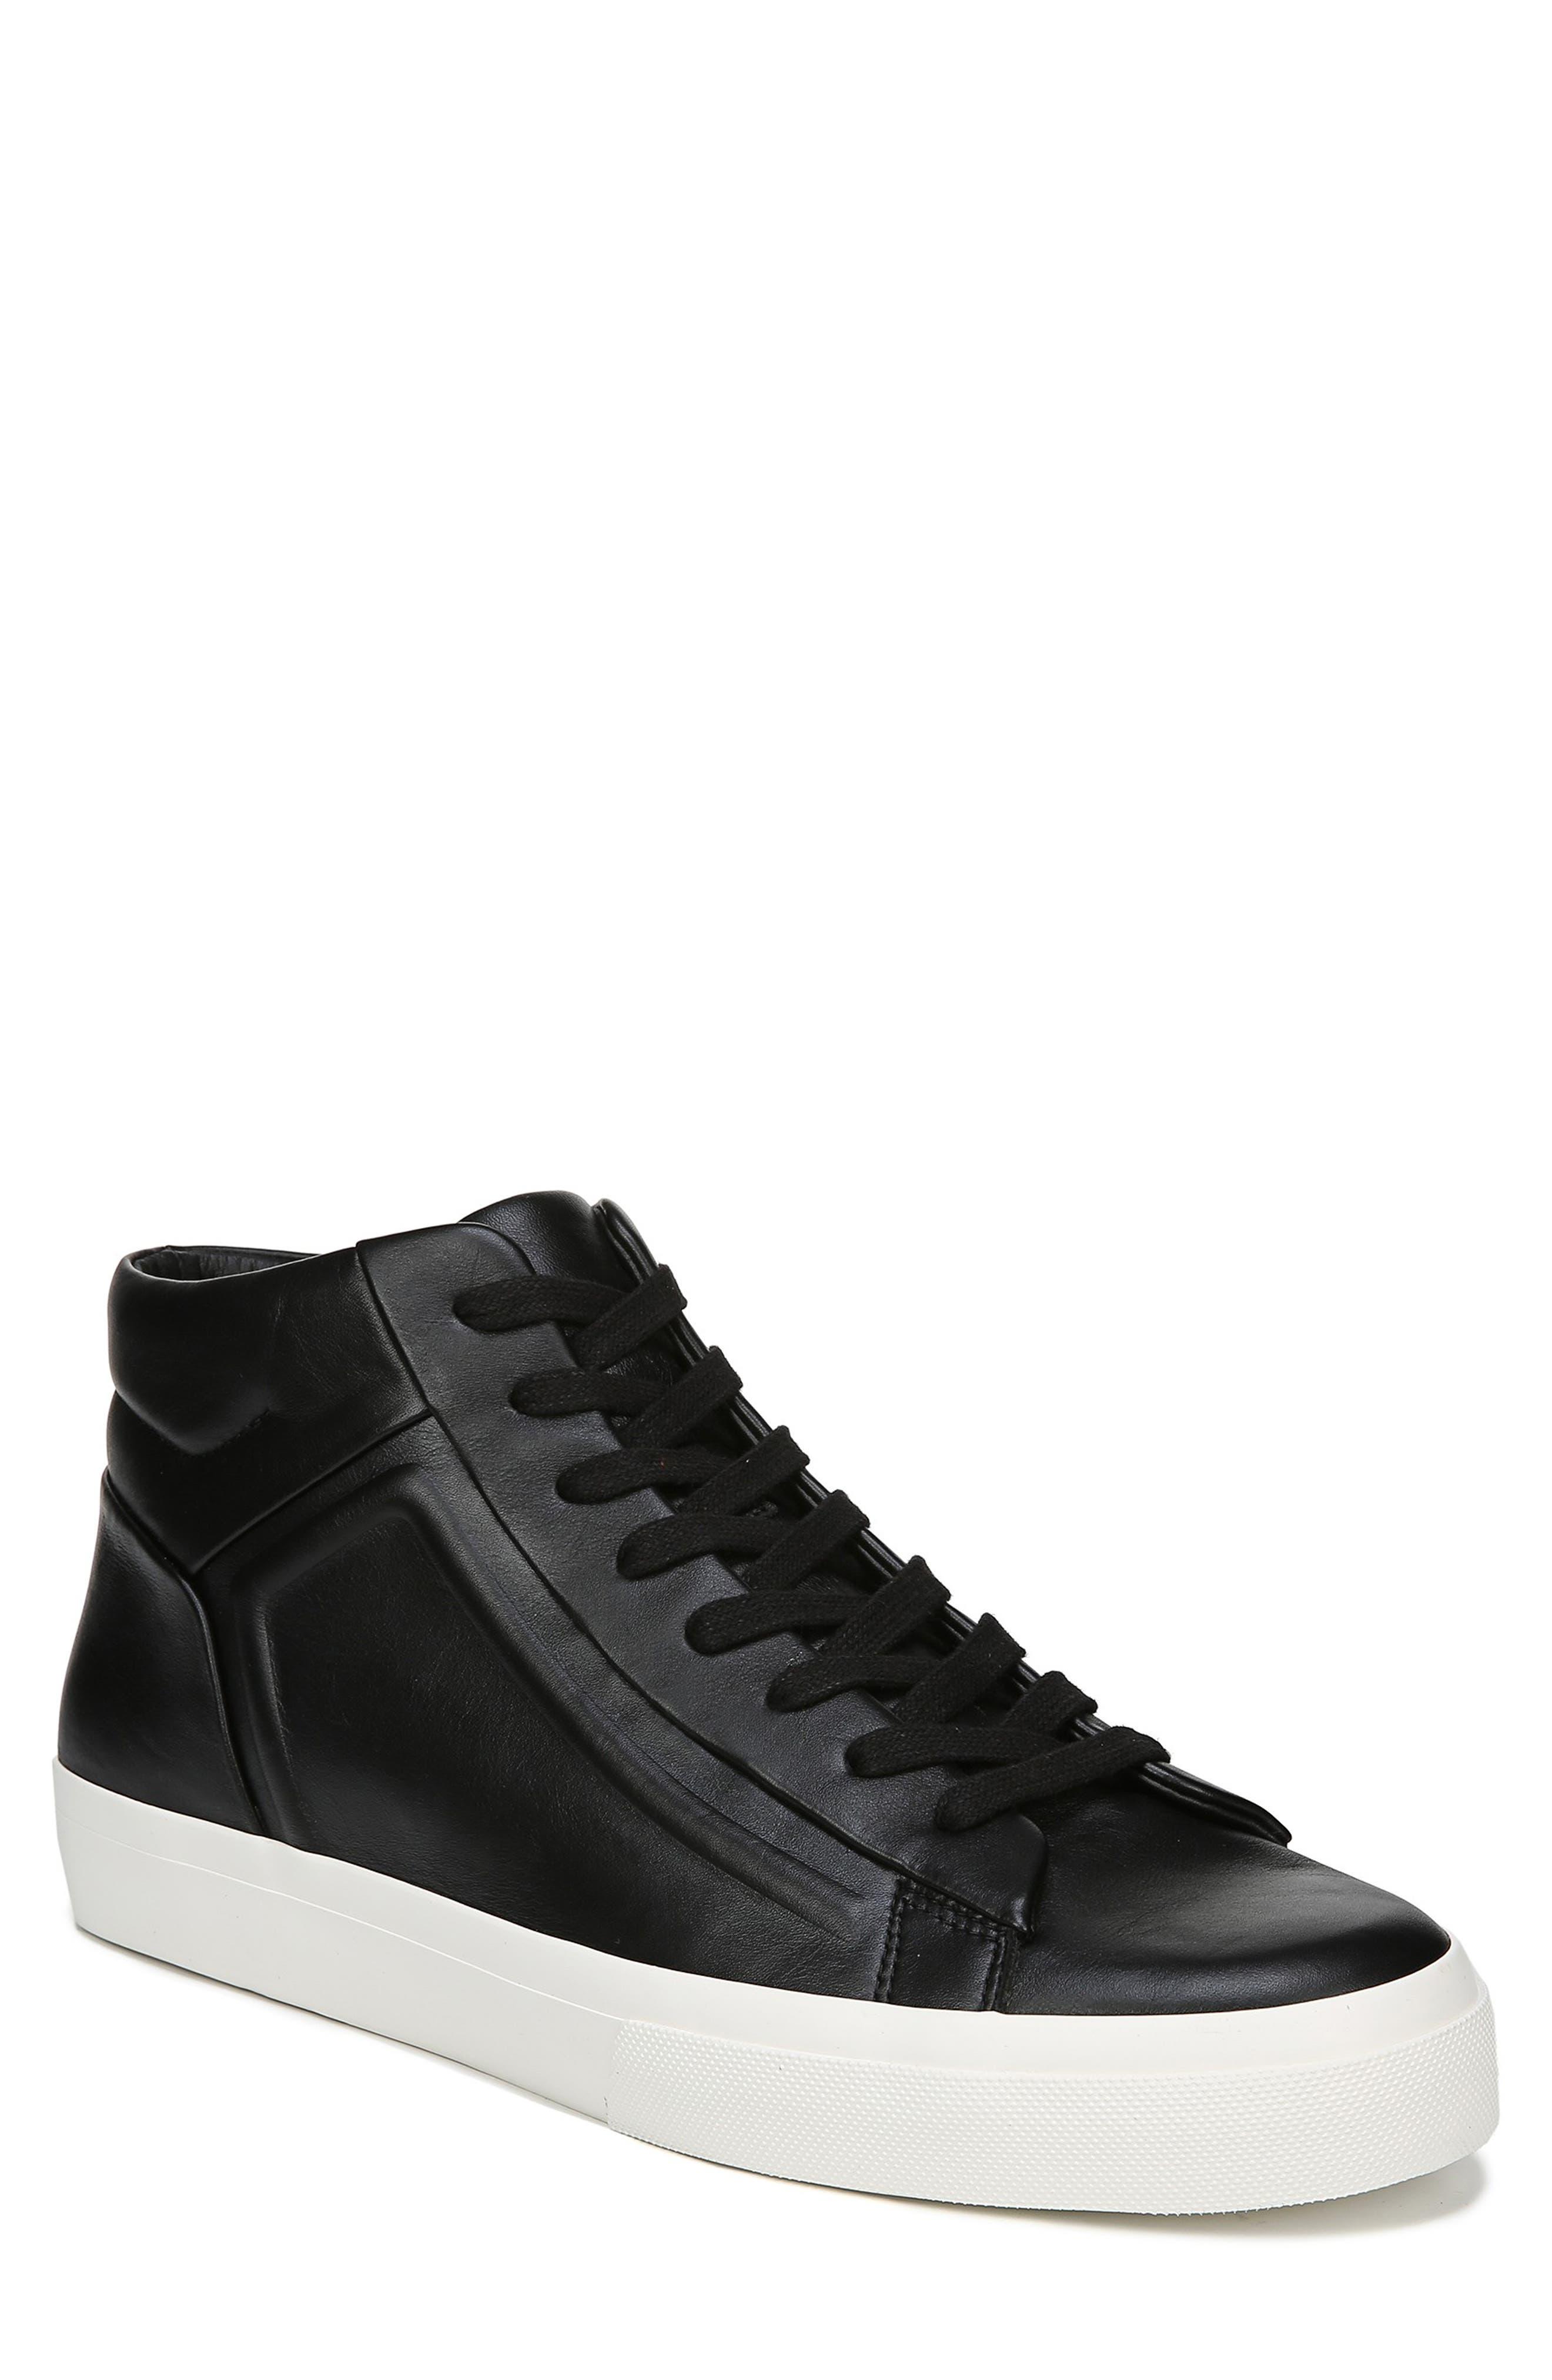 VINCE, Fynn High Top Sneaker, Main thumbnail 1, color, BLACK